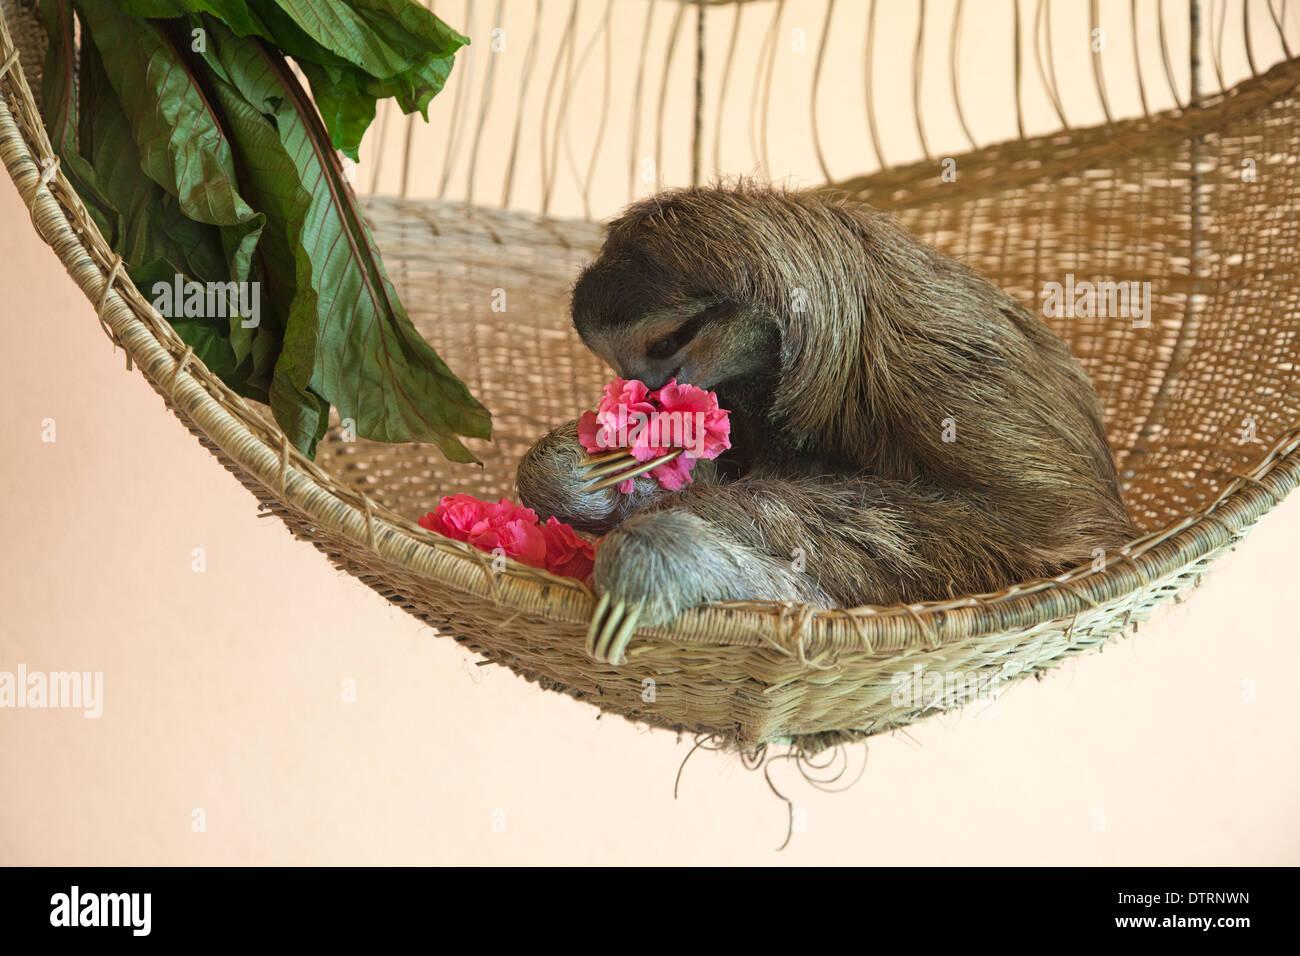 Rescued Three Toed Sloth Bradypus Variegatus Eating Hibiscus Stock